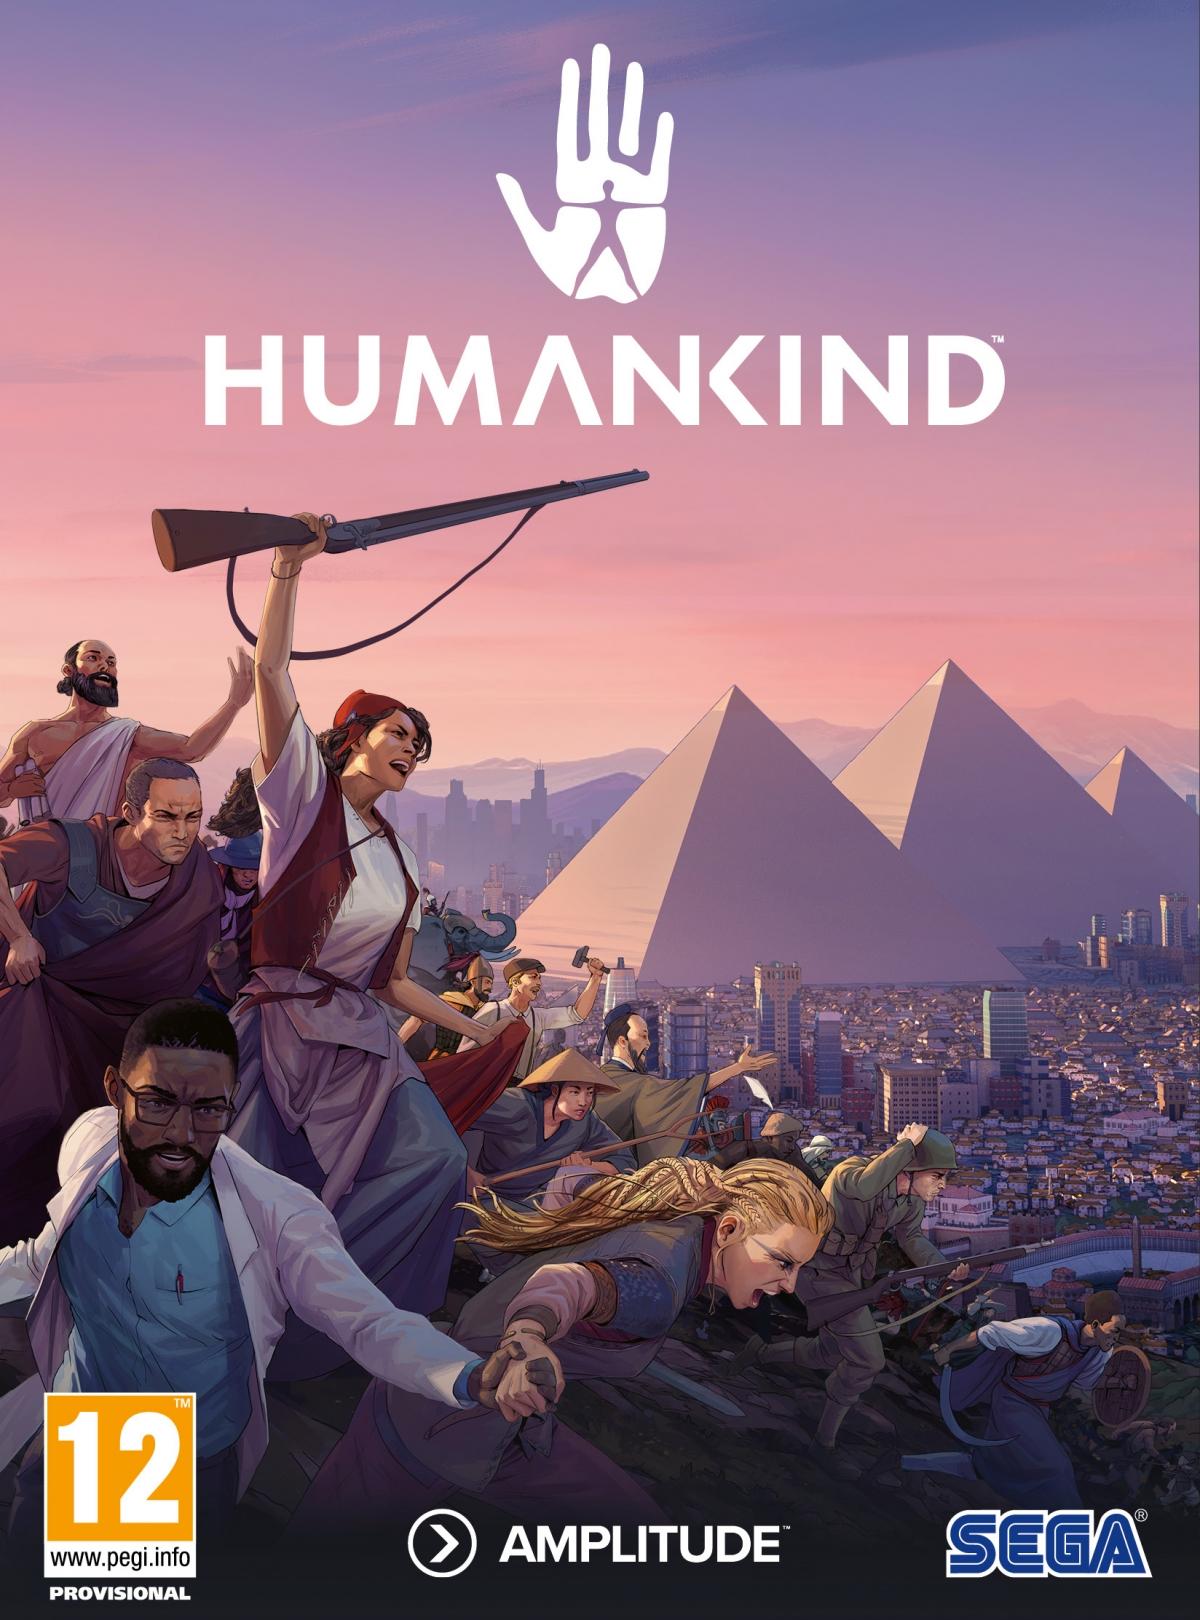 PC Humankind Steelbook Edition